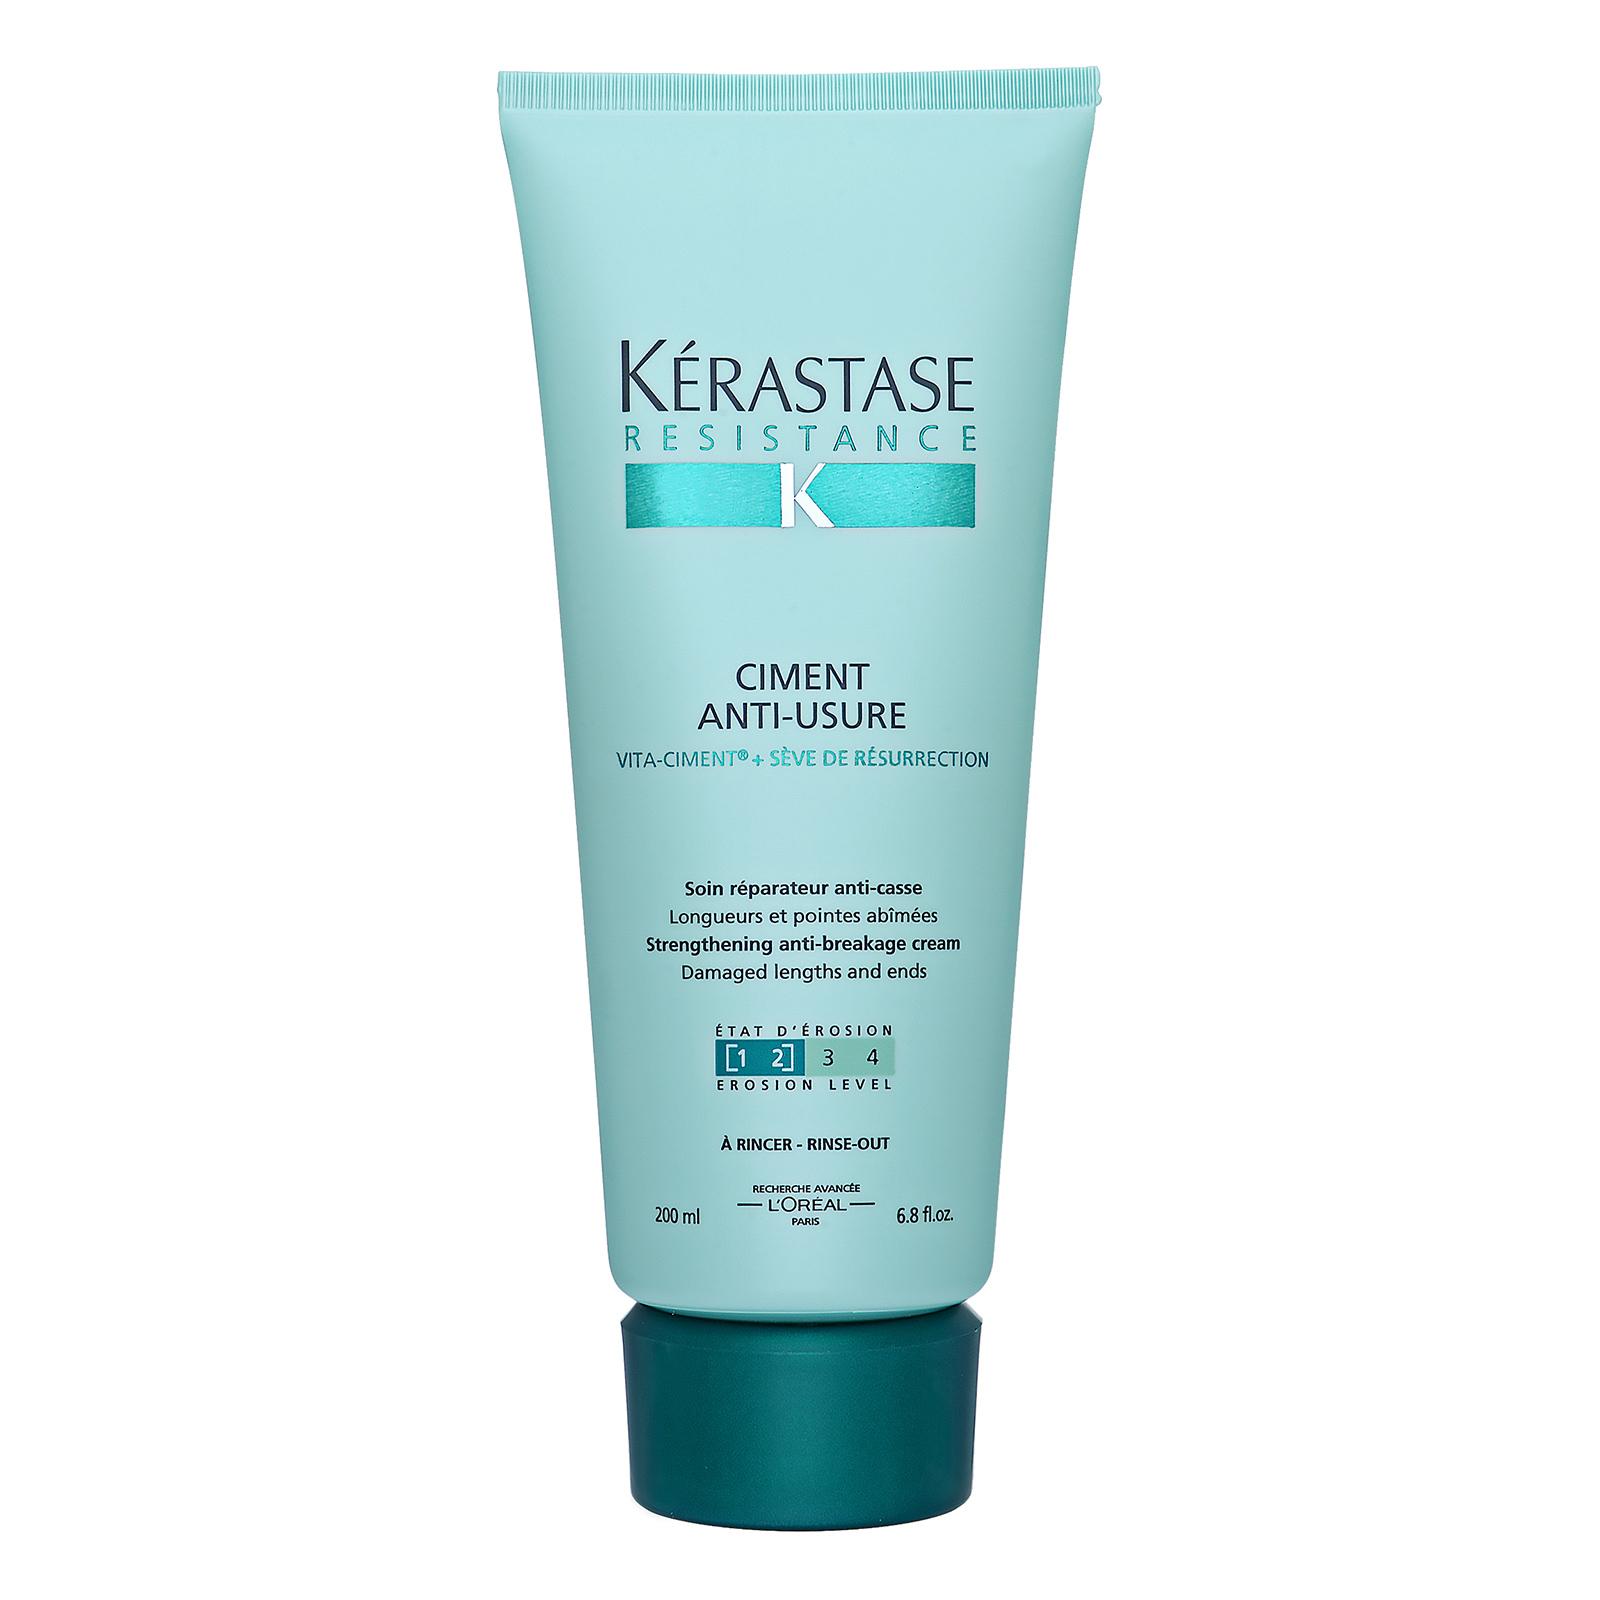 Kérastase Paris Resistance Ciment Anti-Usure Strengthening Anti-Breakage Cream (For Damaged Lengths and Ends) 6.8oz, 200ml